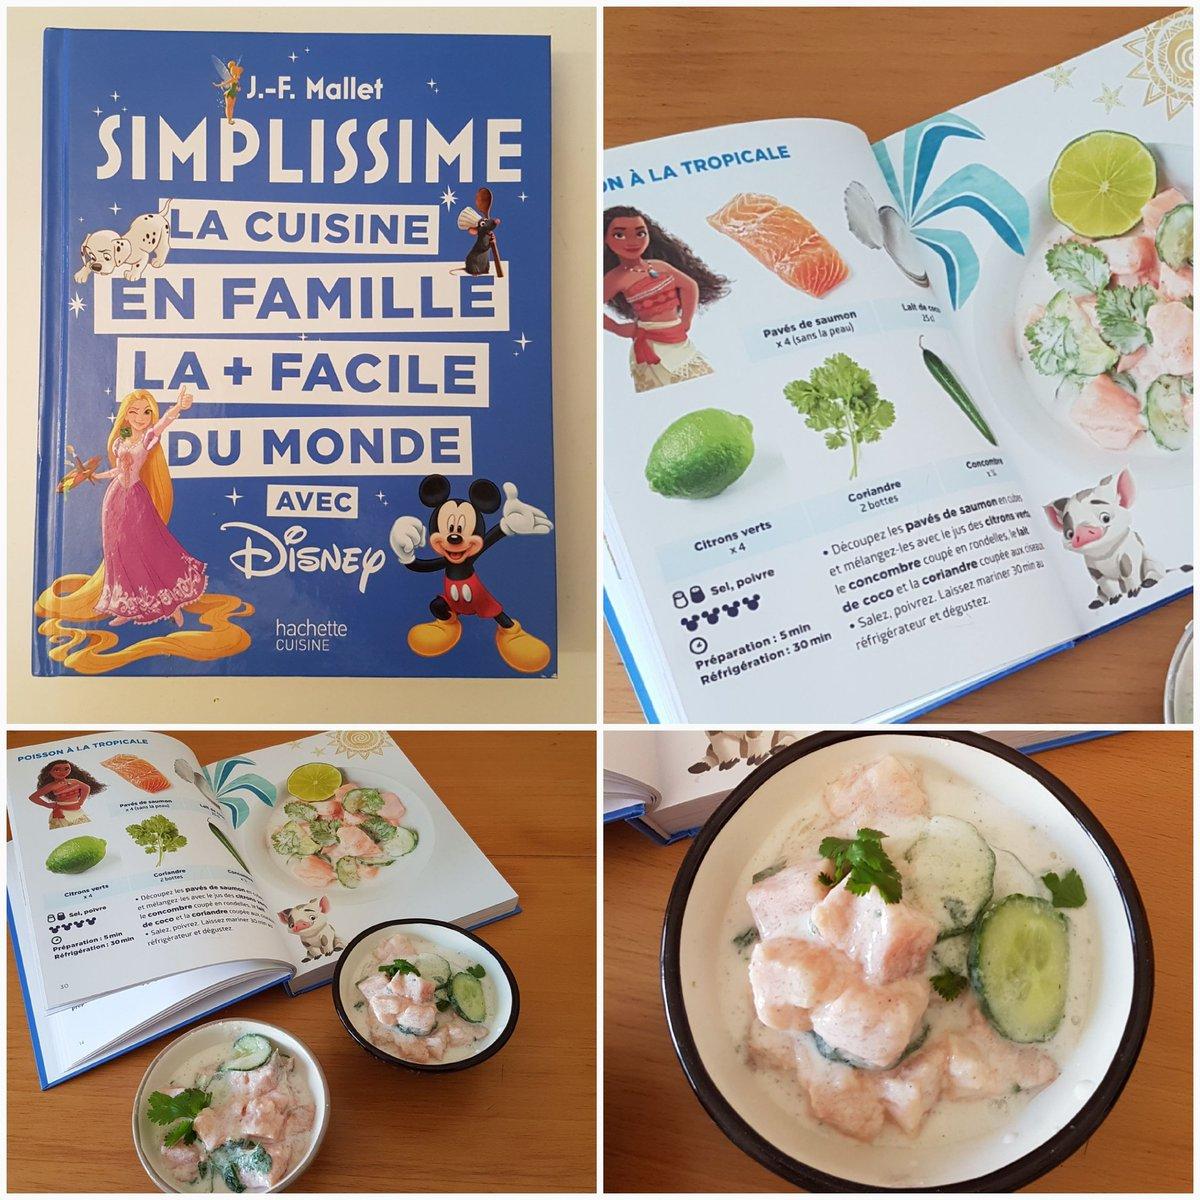 Hachette Cuisine Simplissime